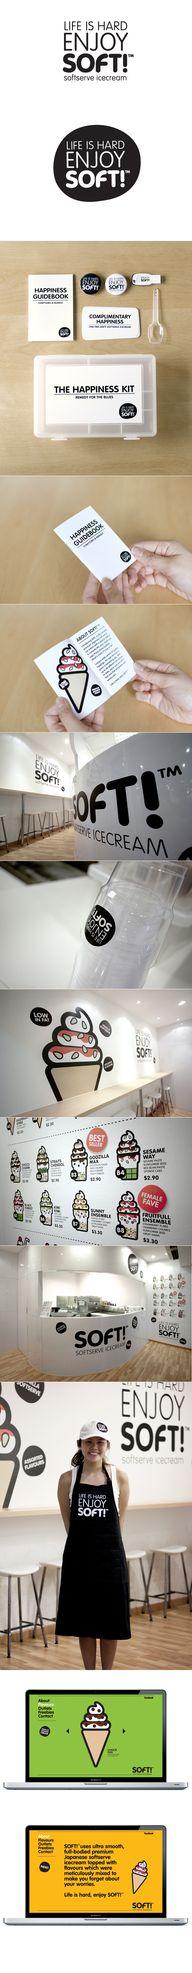 SoftTM branding by B